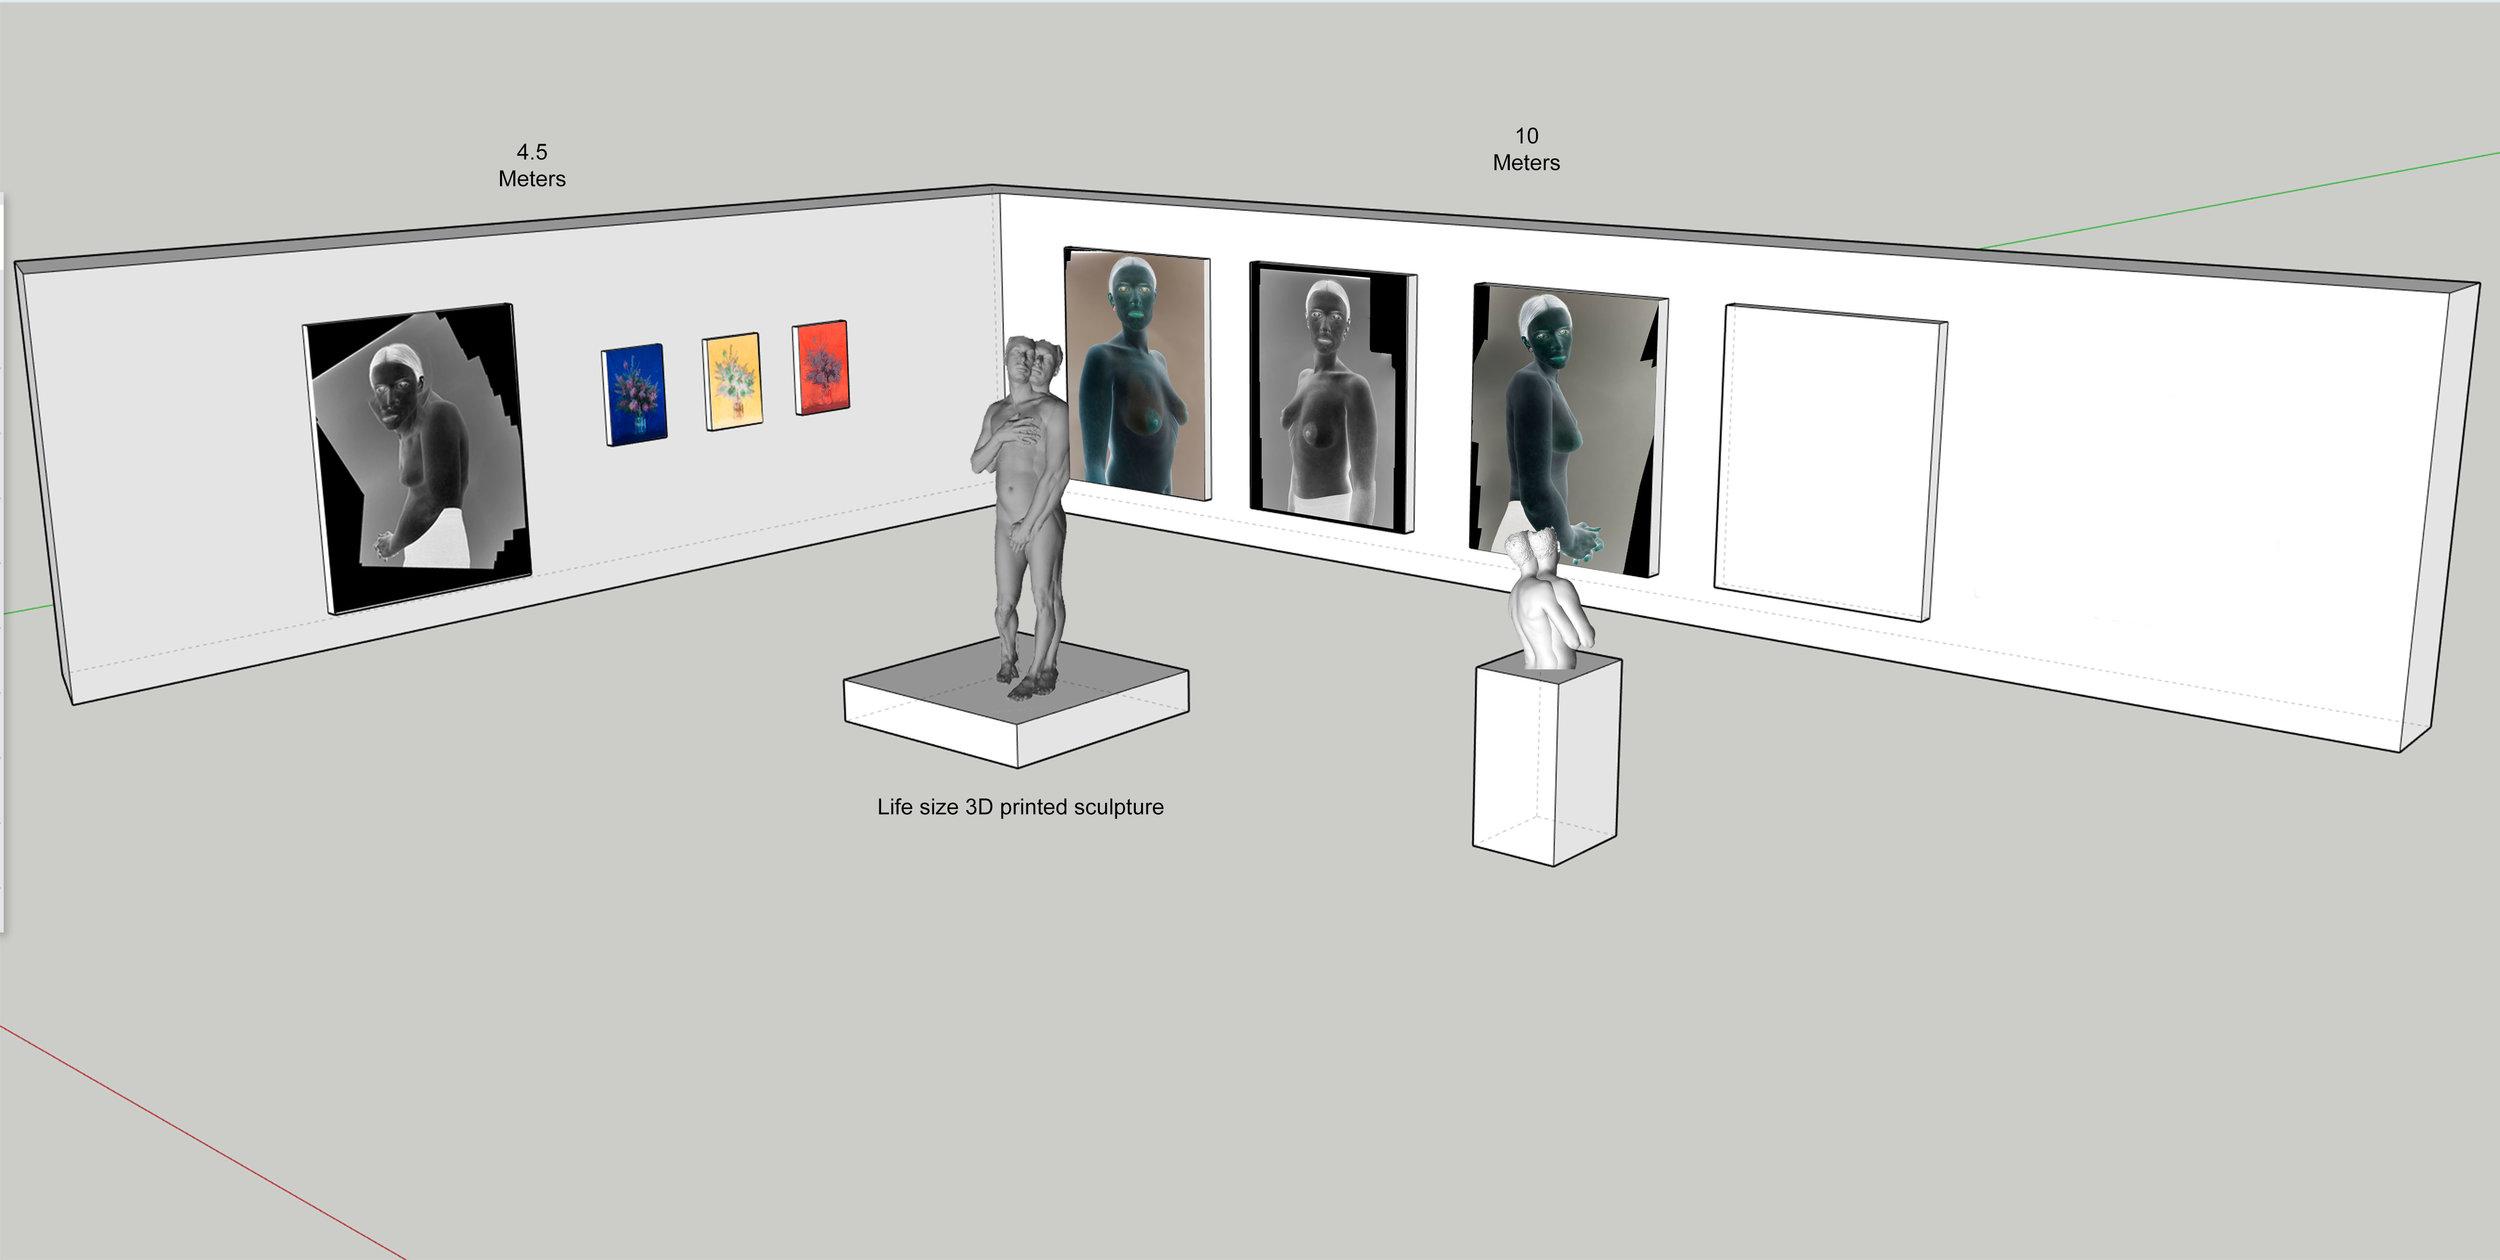 01_Installation view preposal MA Degree show Royal College of Art.jpg